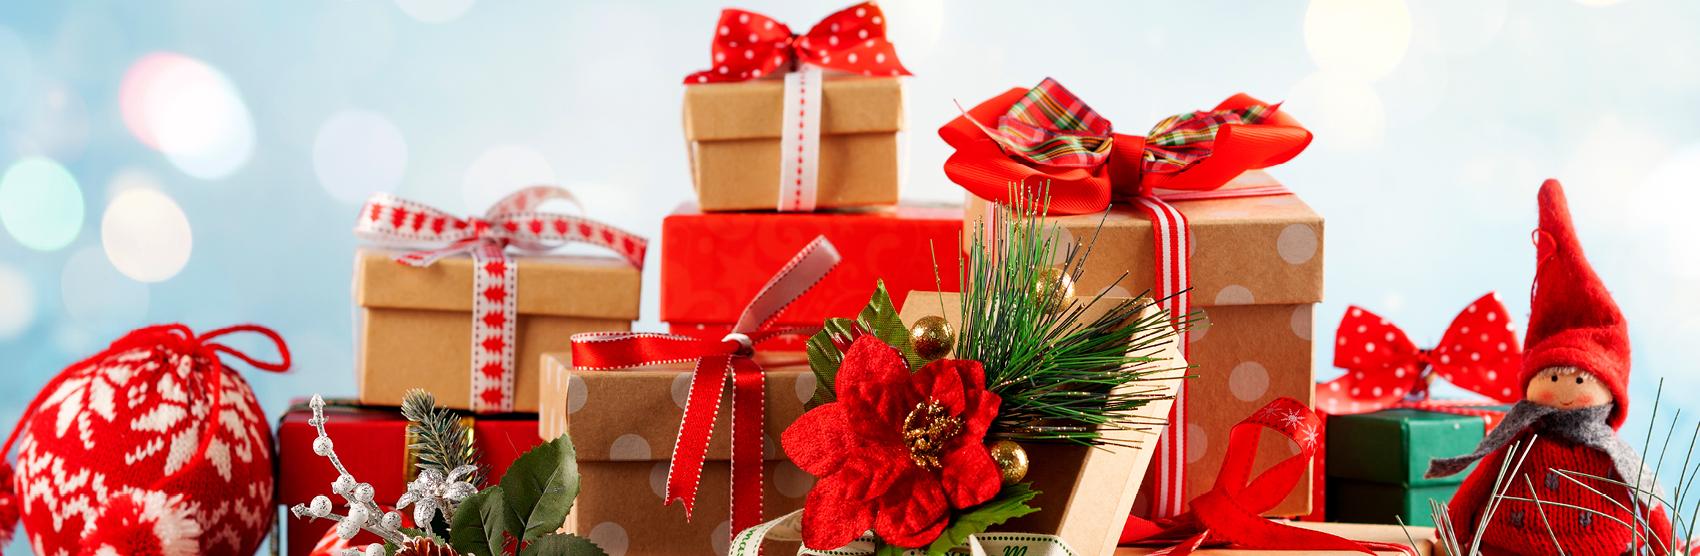 Beautiful holiday gifts